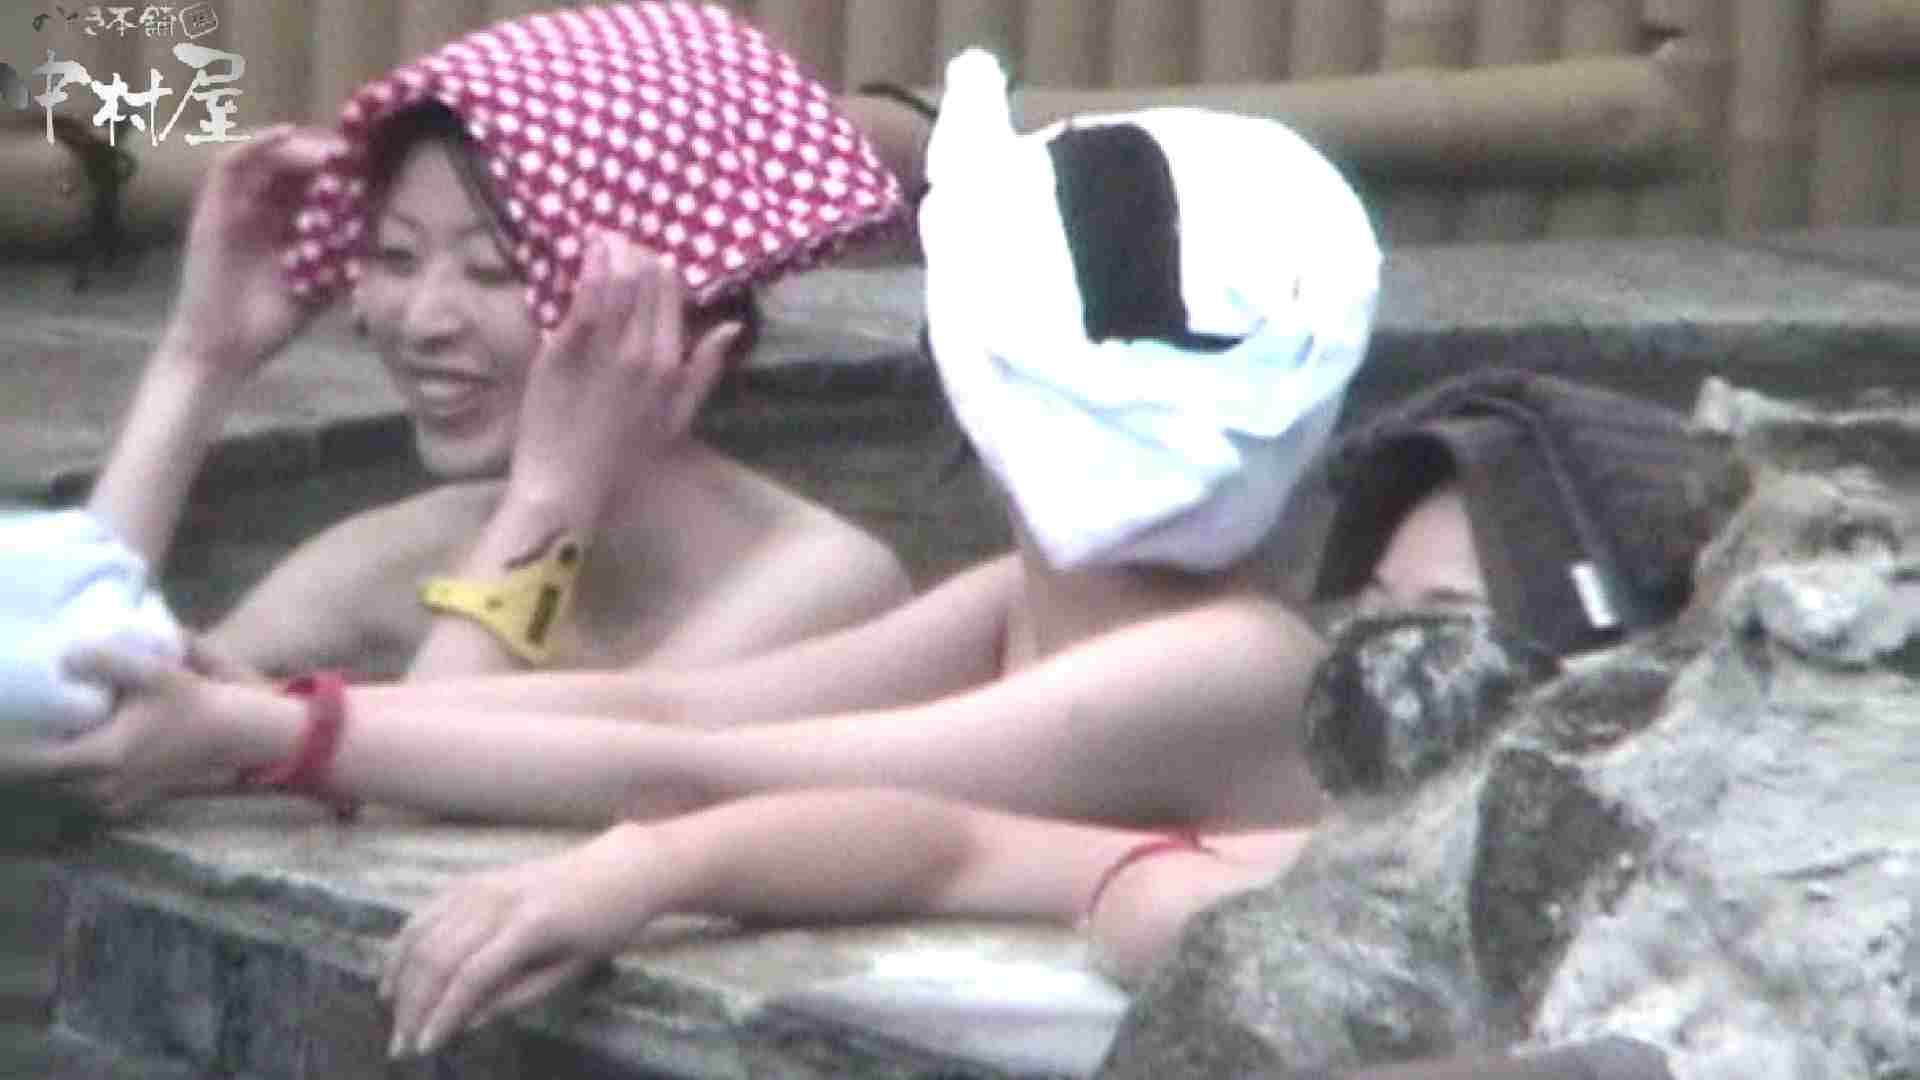 Aquaな露天風呂Vol.554 盗撮師作品  86pic 24